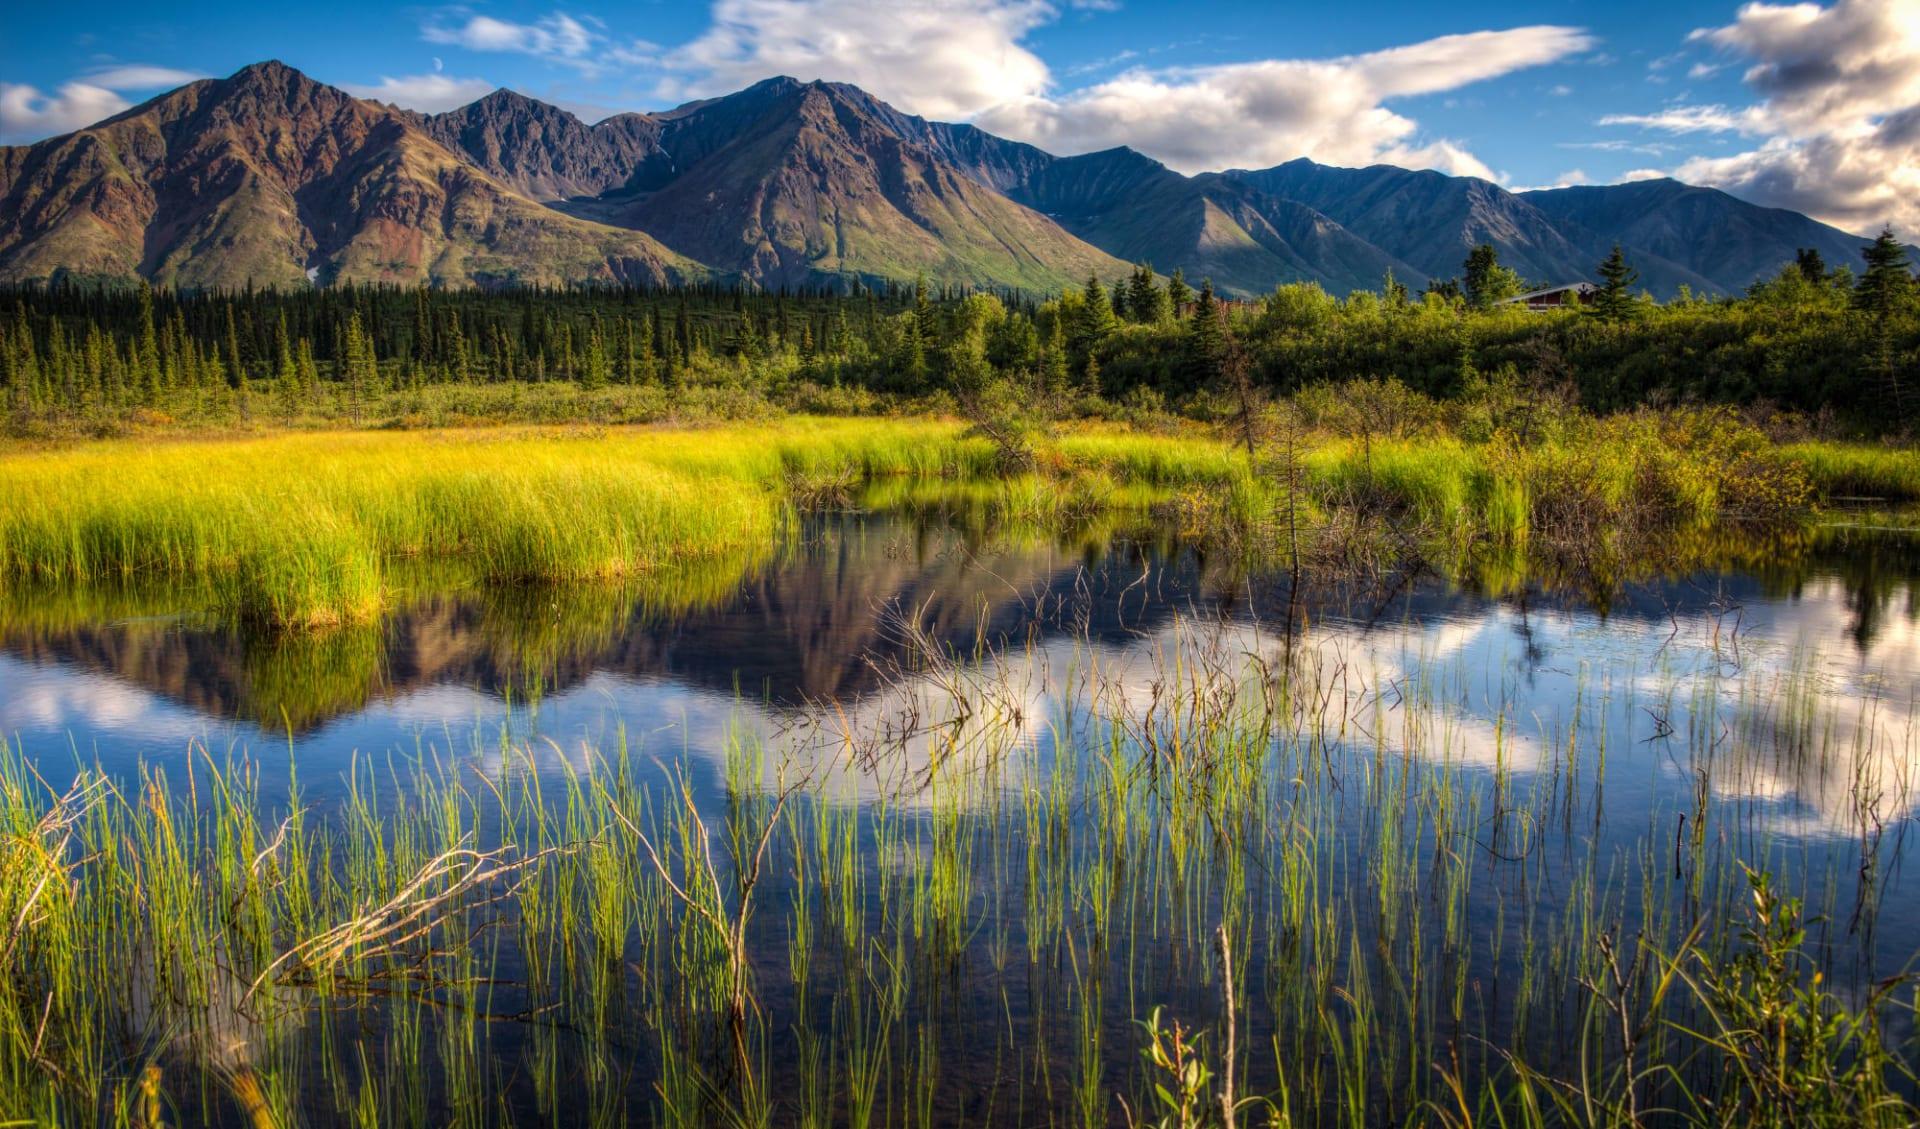 Naturwunder Alaskas ab Anchorage: Alaska - Denali NP - Bergkette